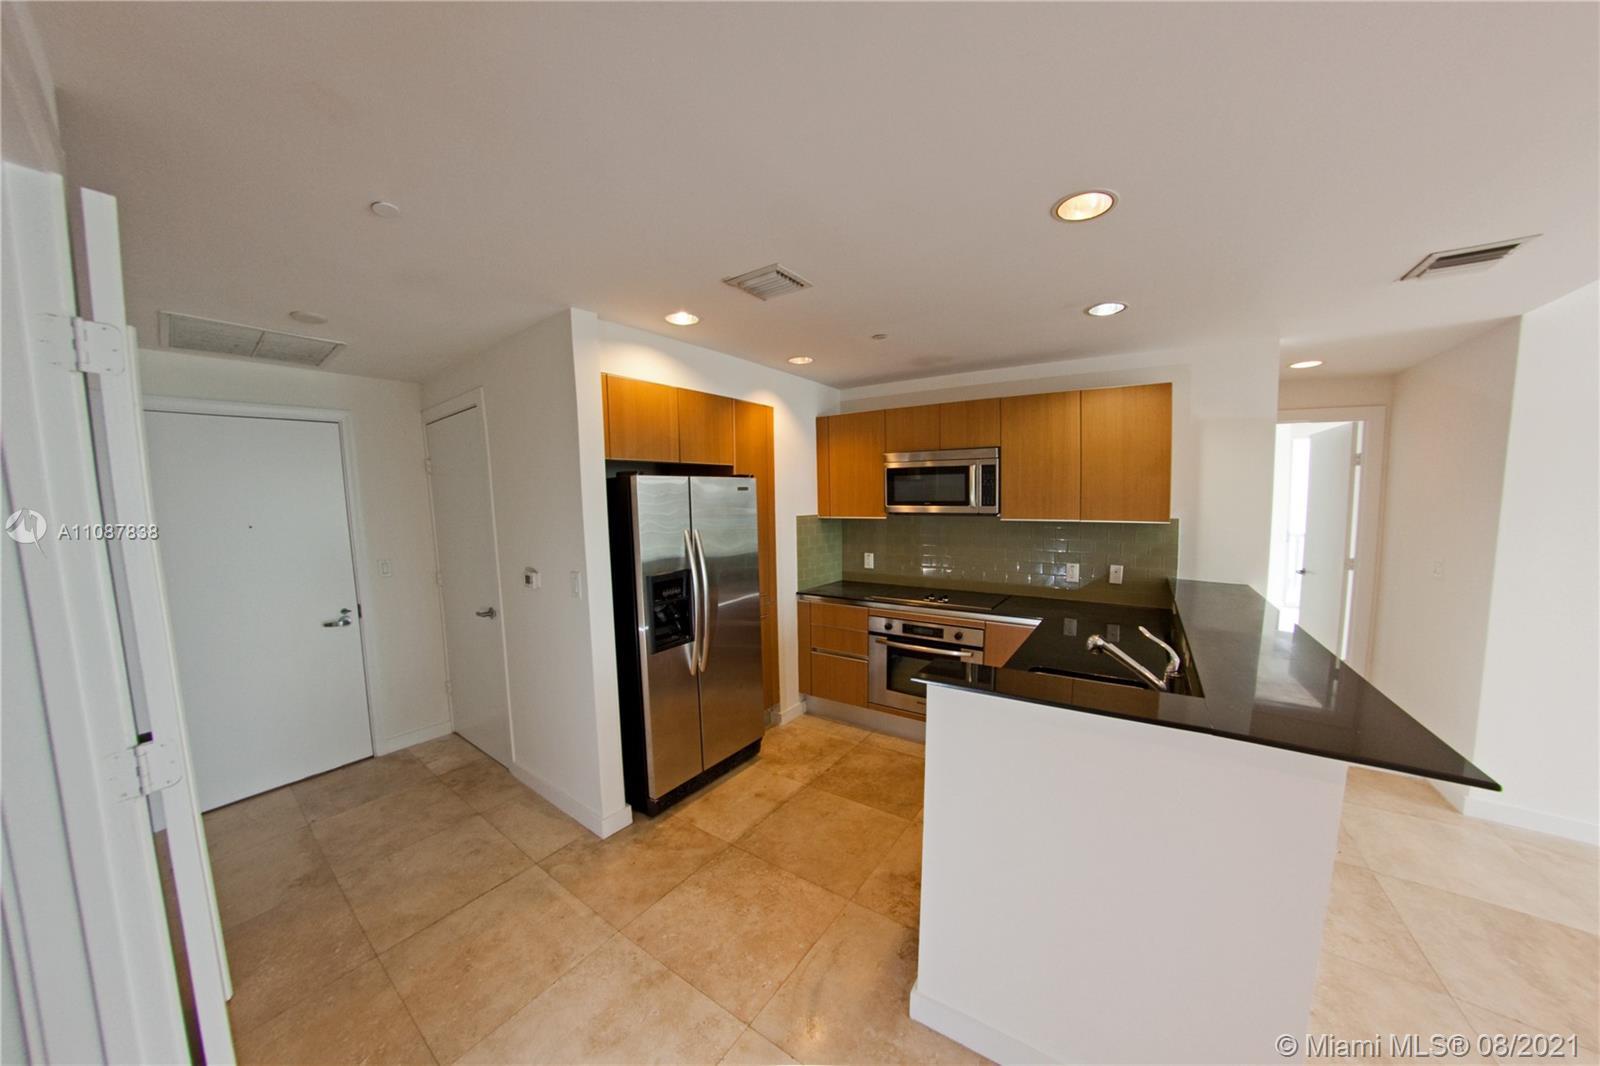 1060 Brickell West Tower #3911 - 1060 Brickell Ave #3911, Miami, FL 33131